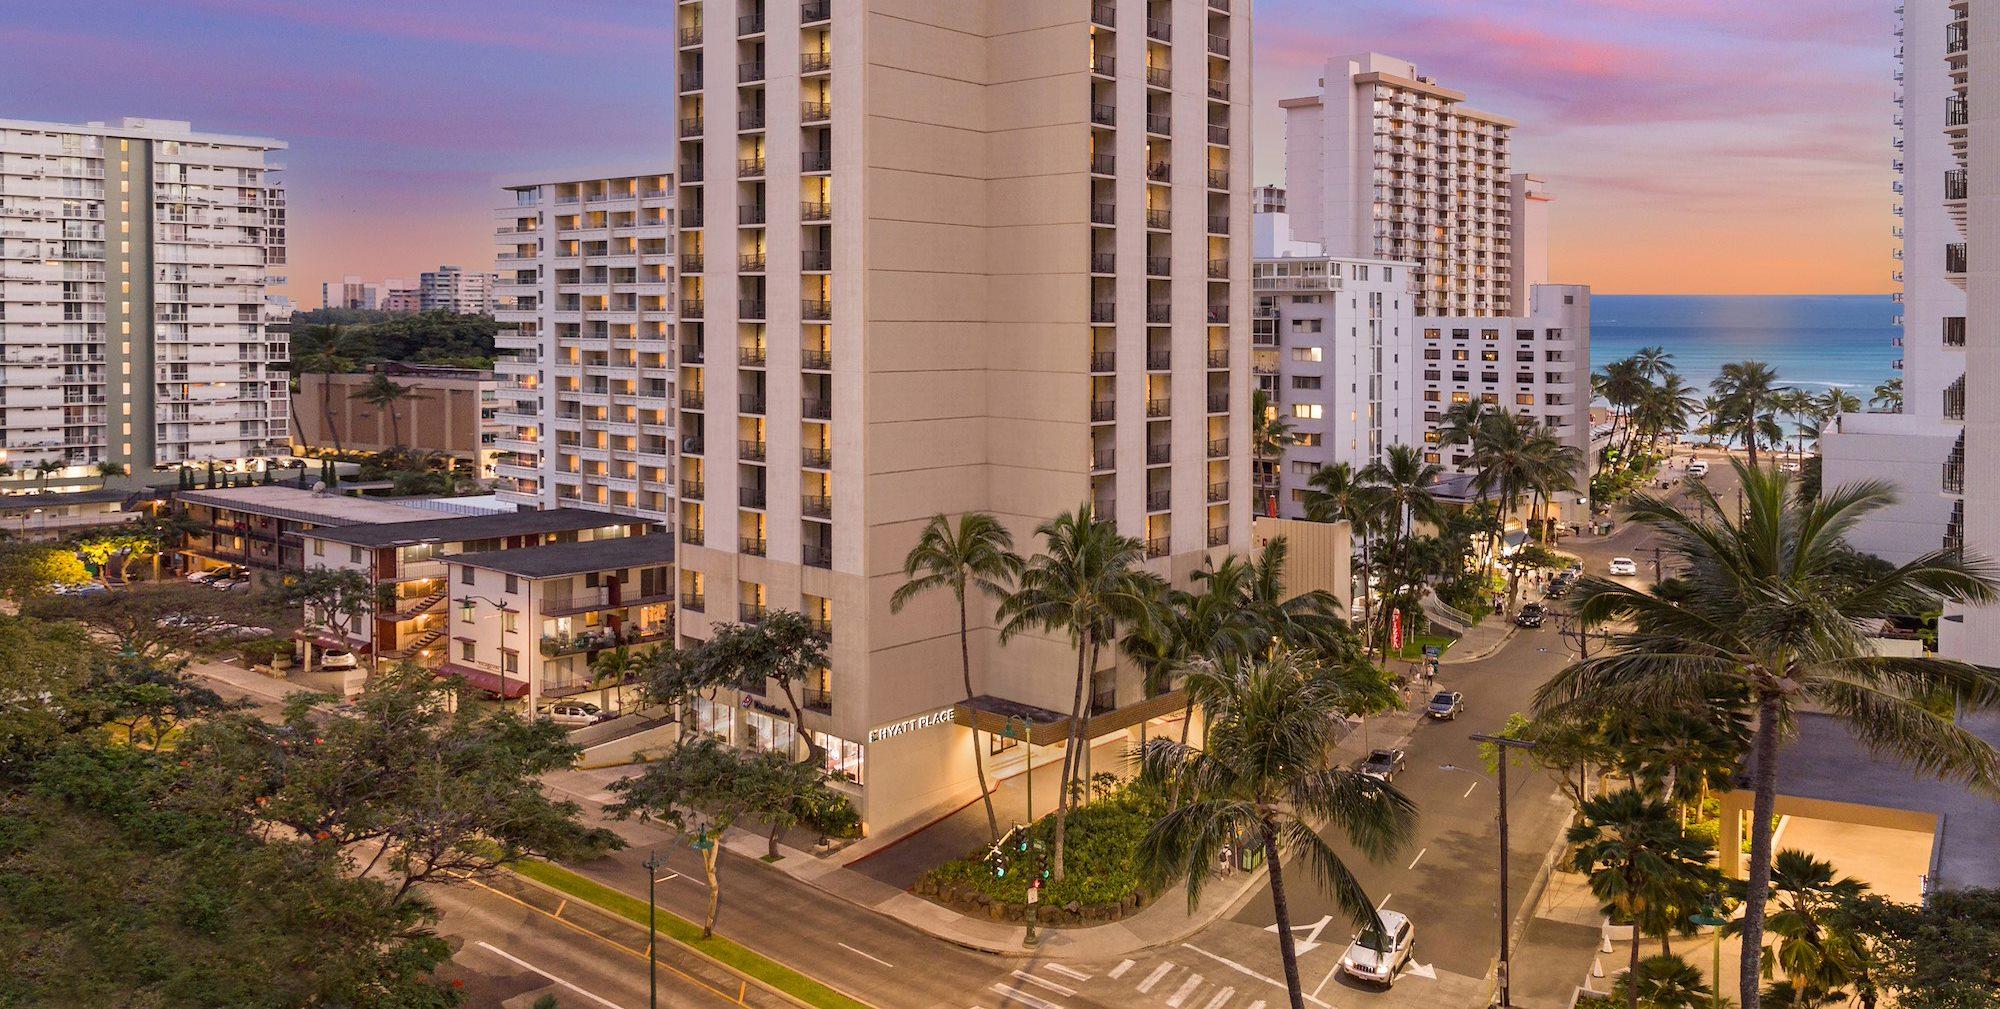 Exterior of Hyatt Place Waikiki Beach